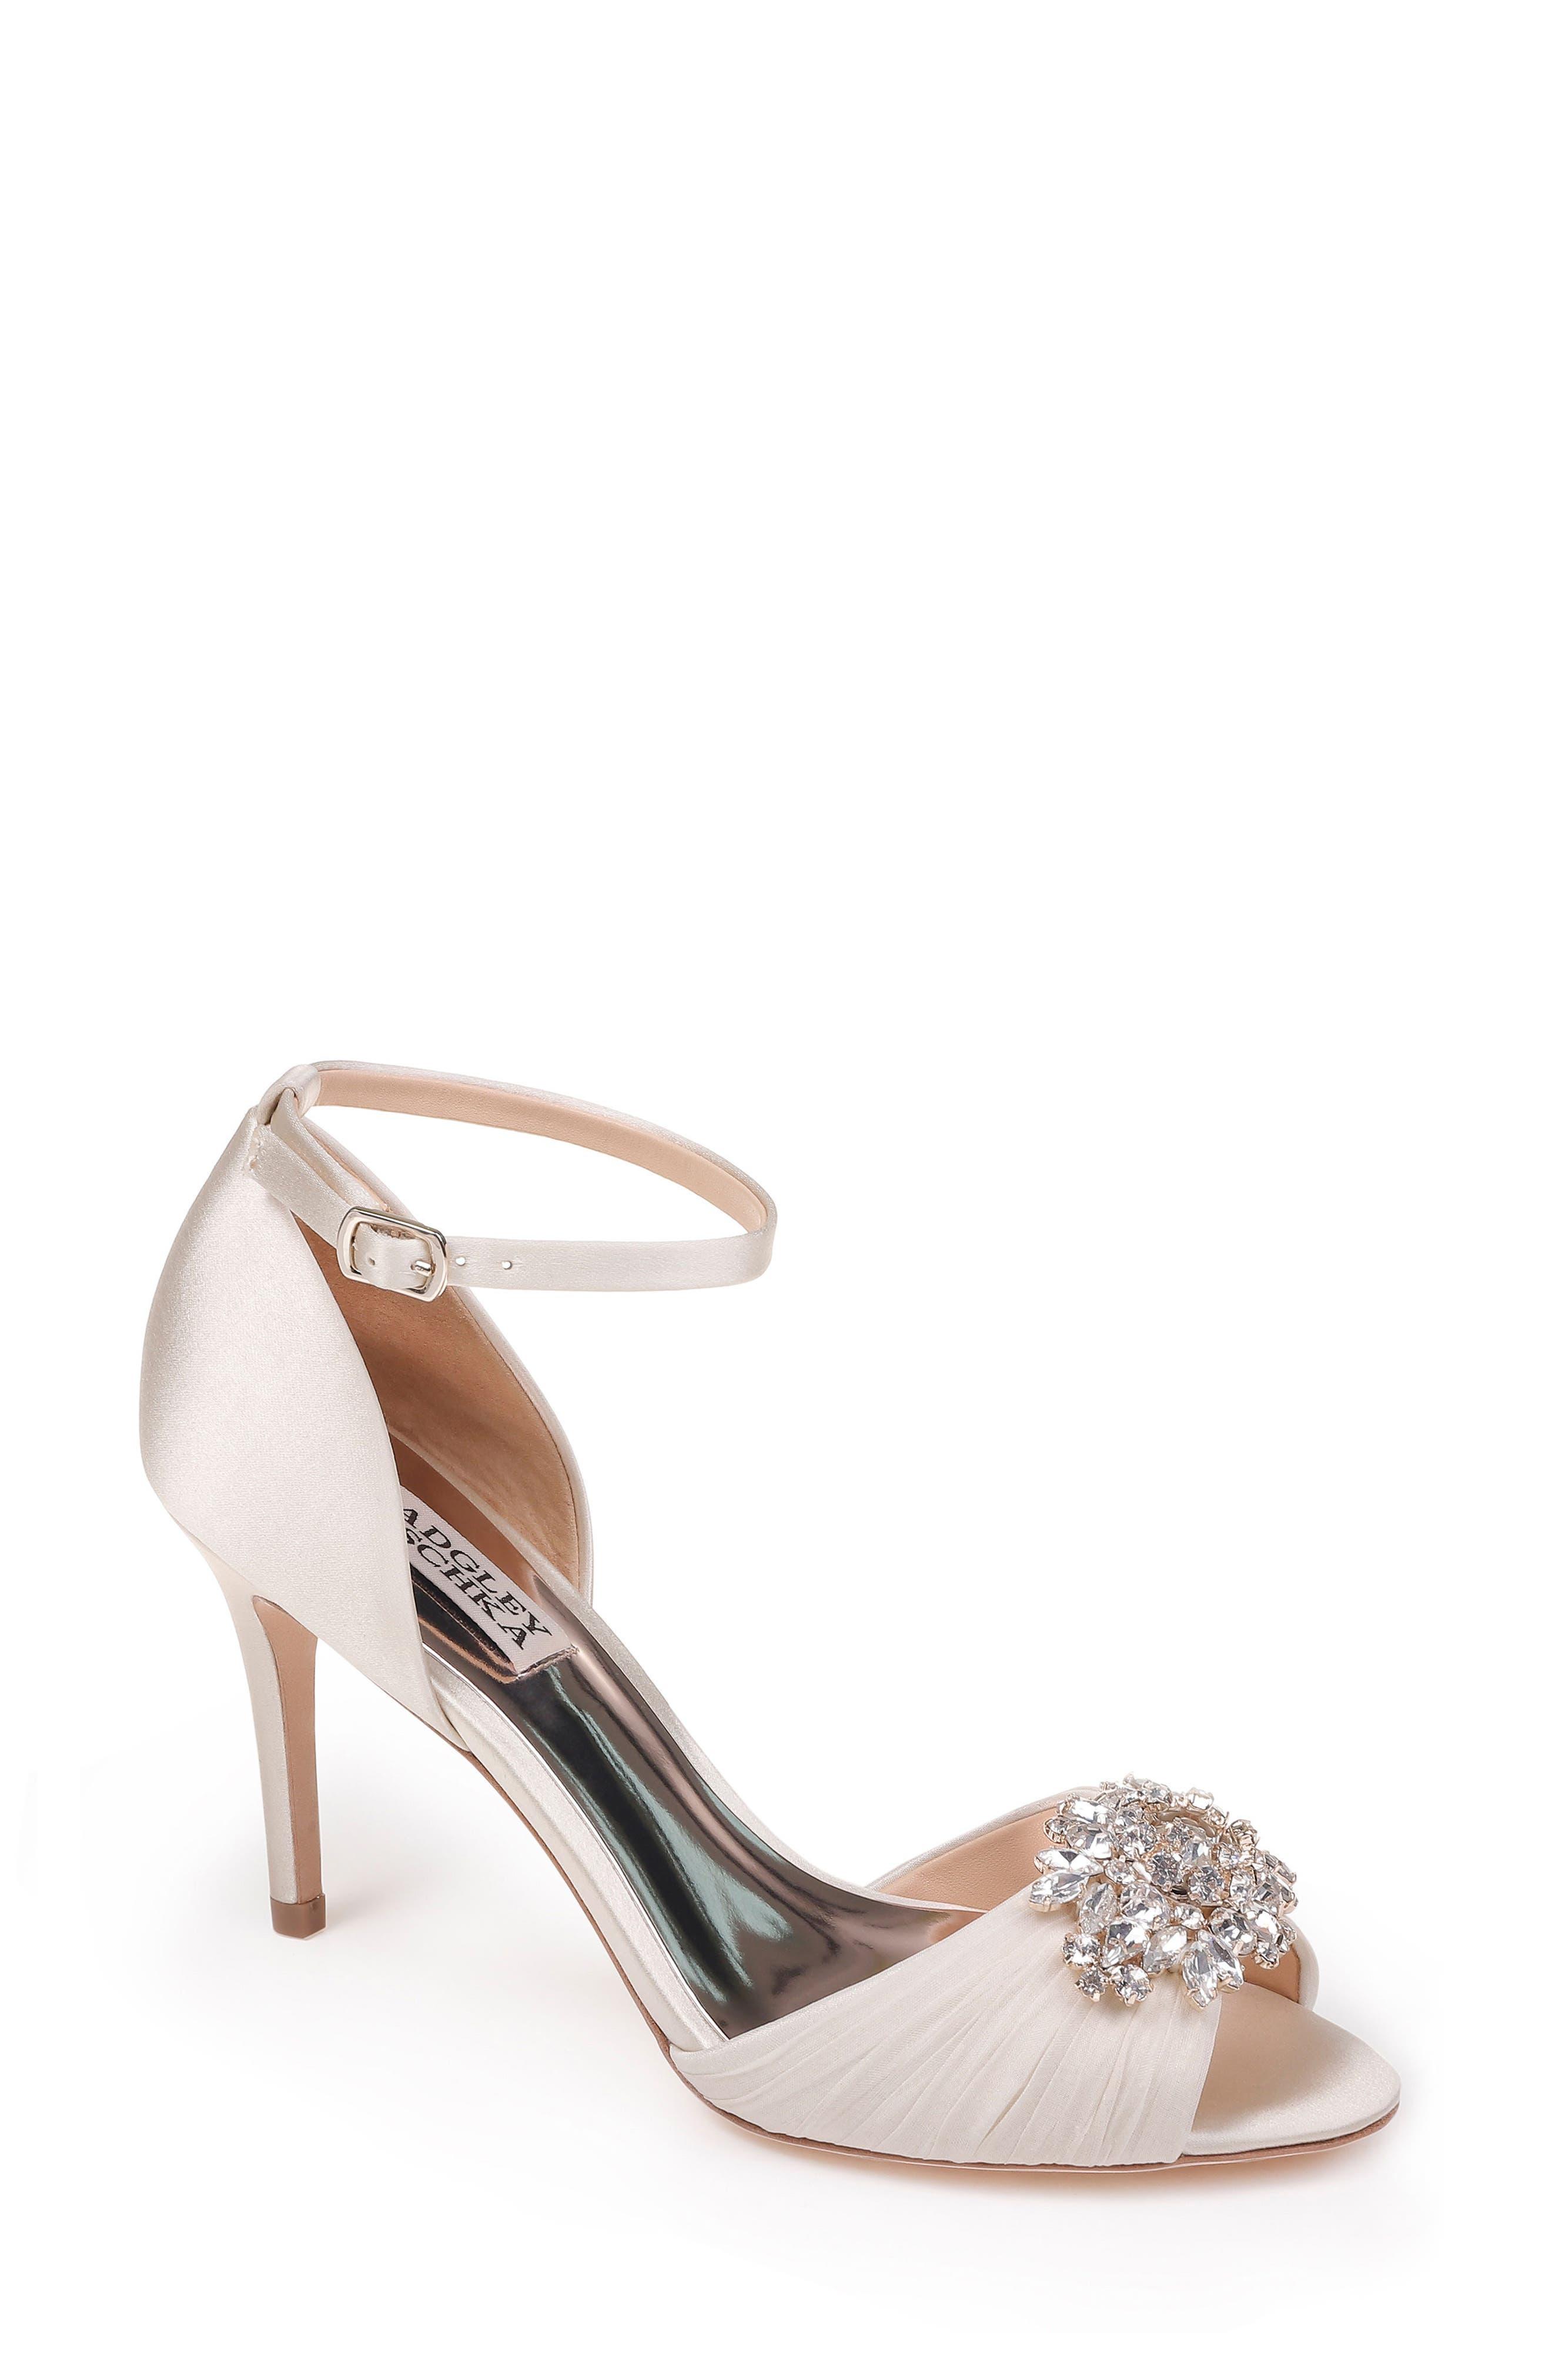 BADGLEY MISCHKA COLLECTION Badgley Mischka Sabrina Ankle Strap Sandal, Main, color, 100